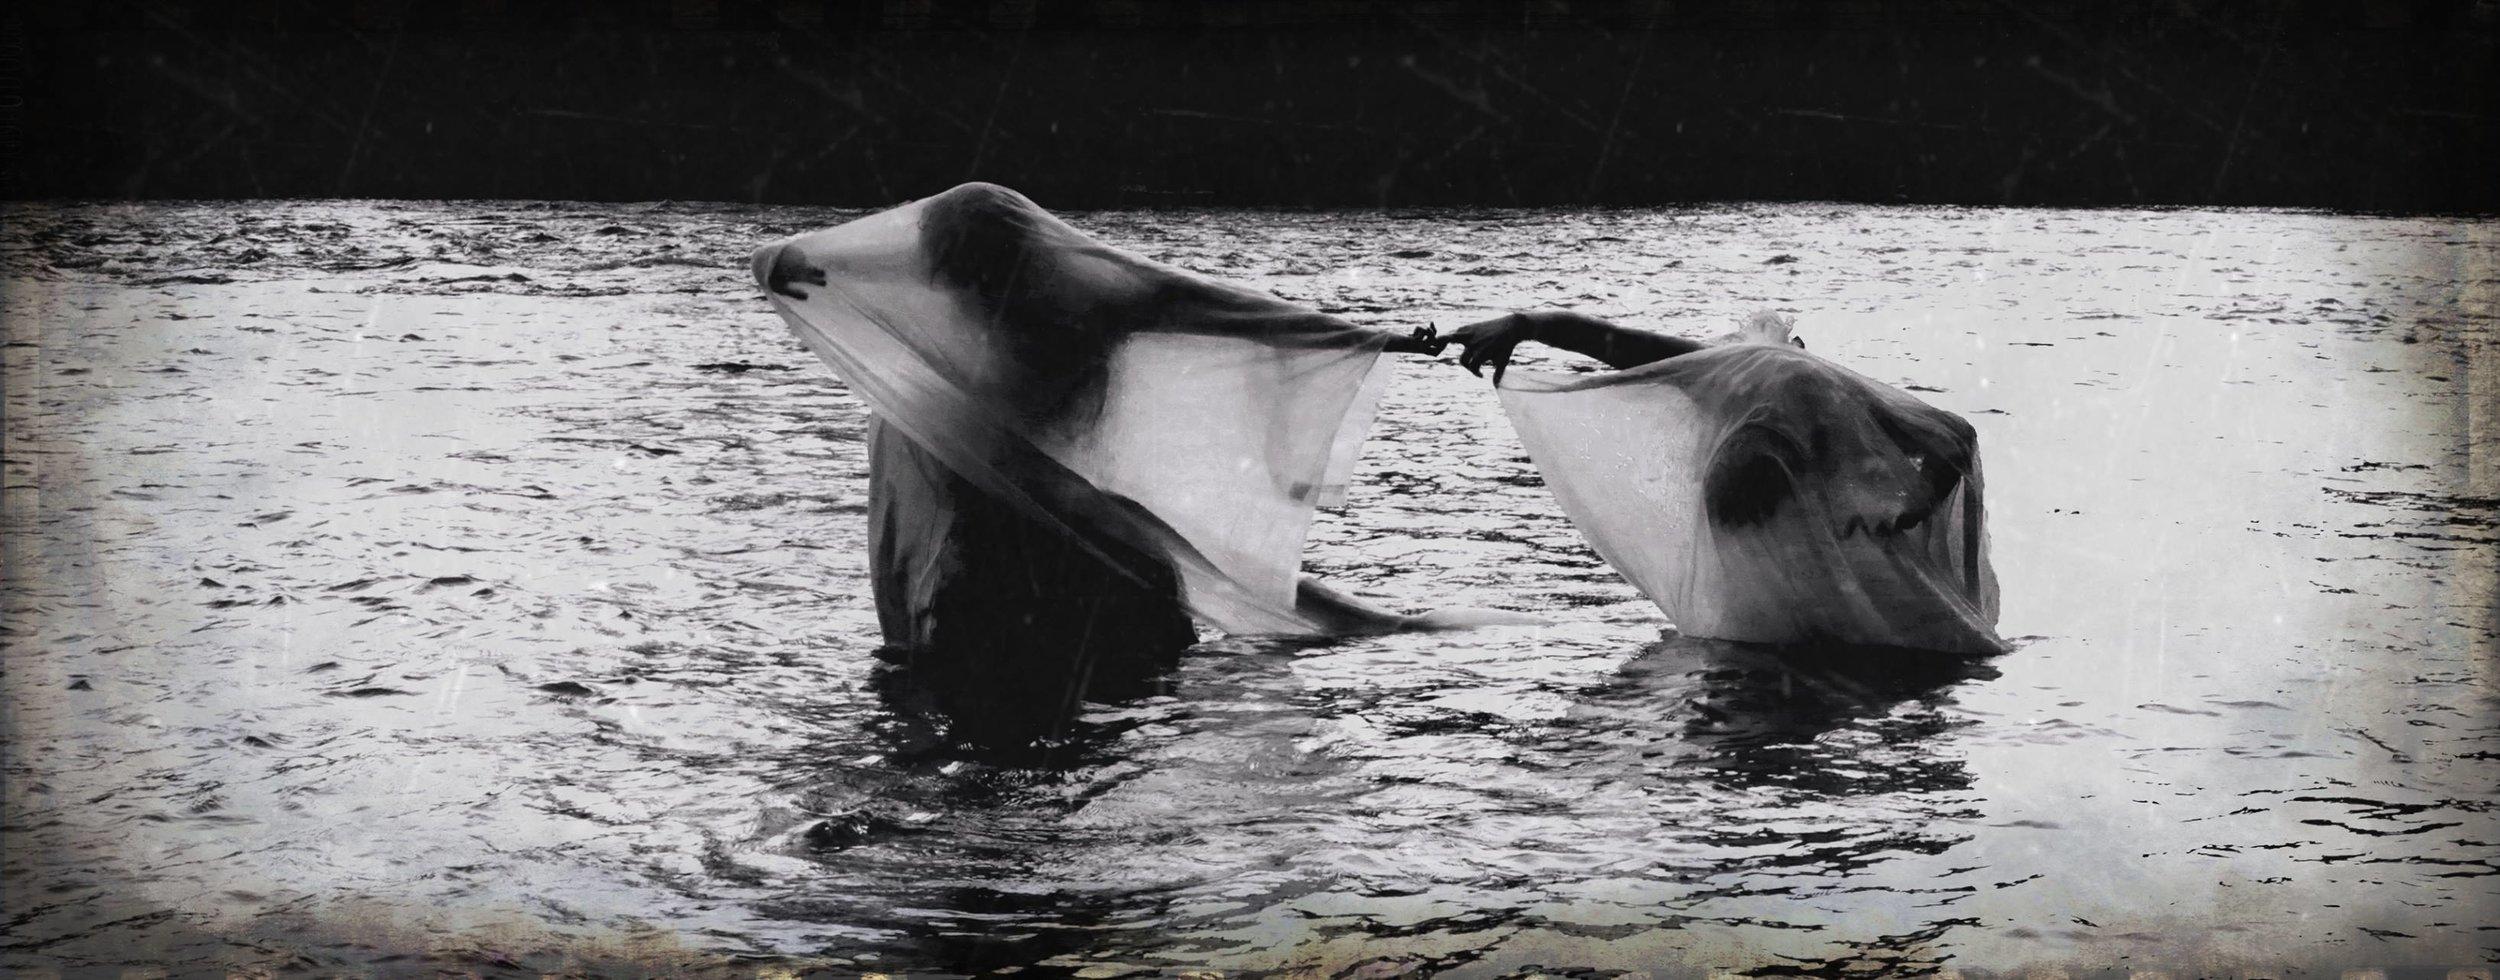 Photography by Richard McConochie, manipulation by Natasha Kolosowsky